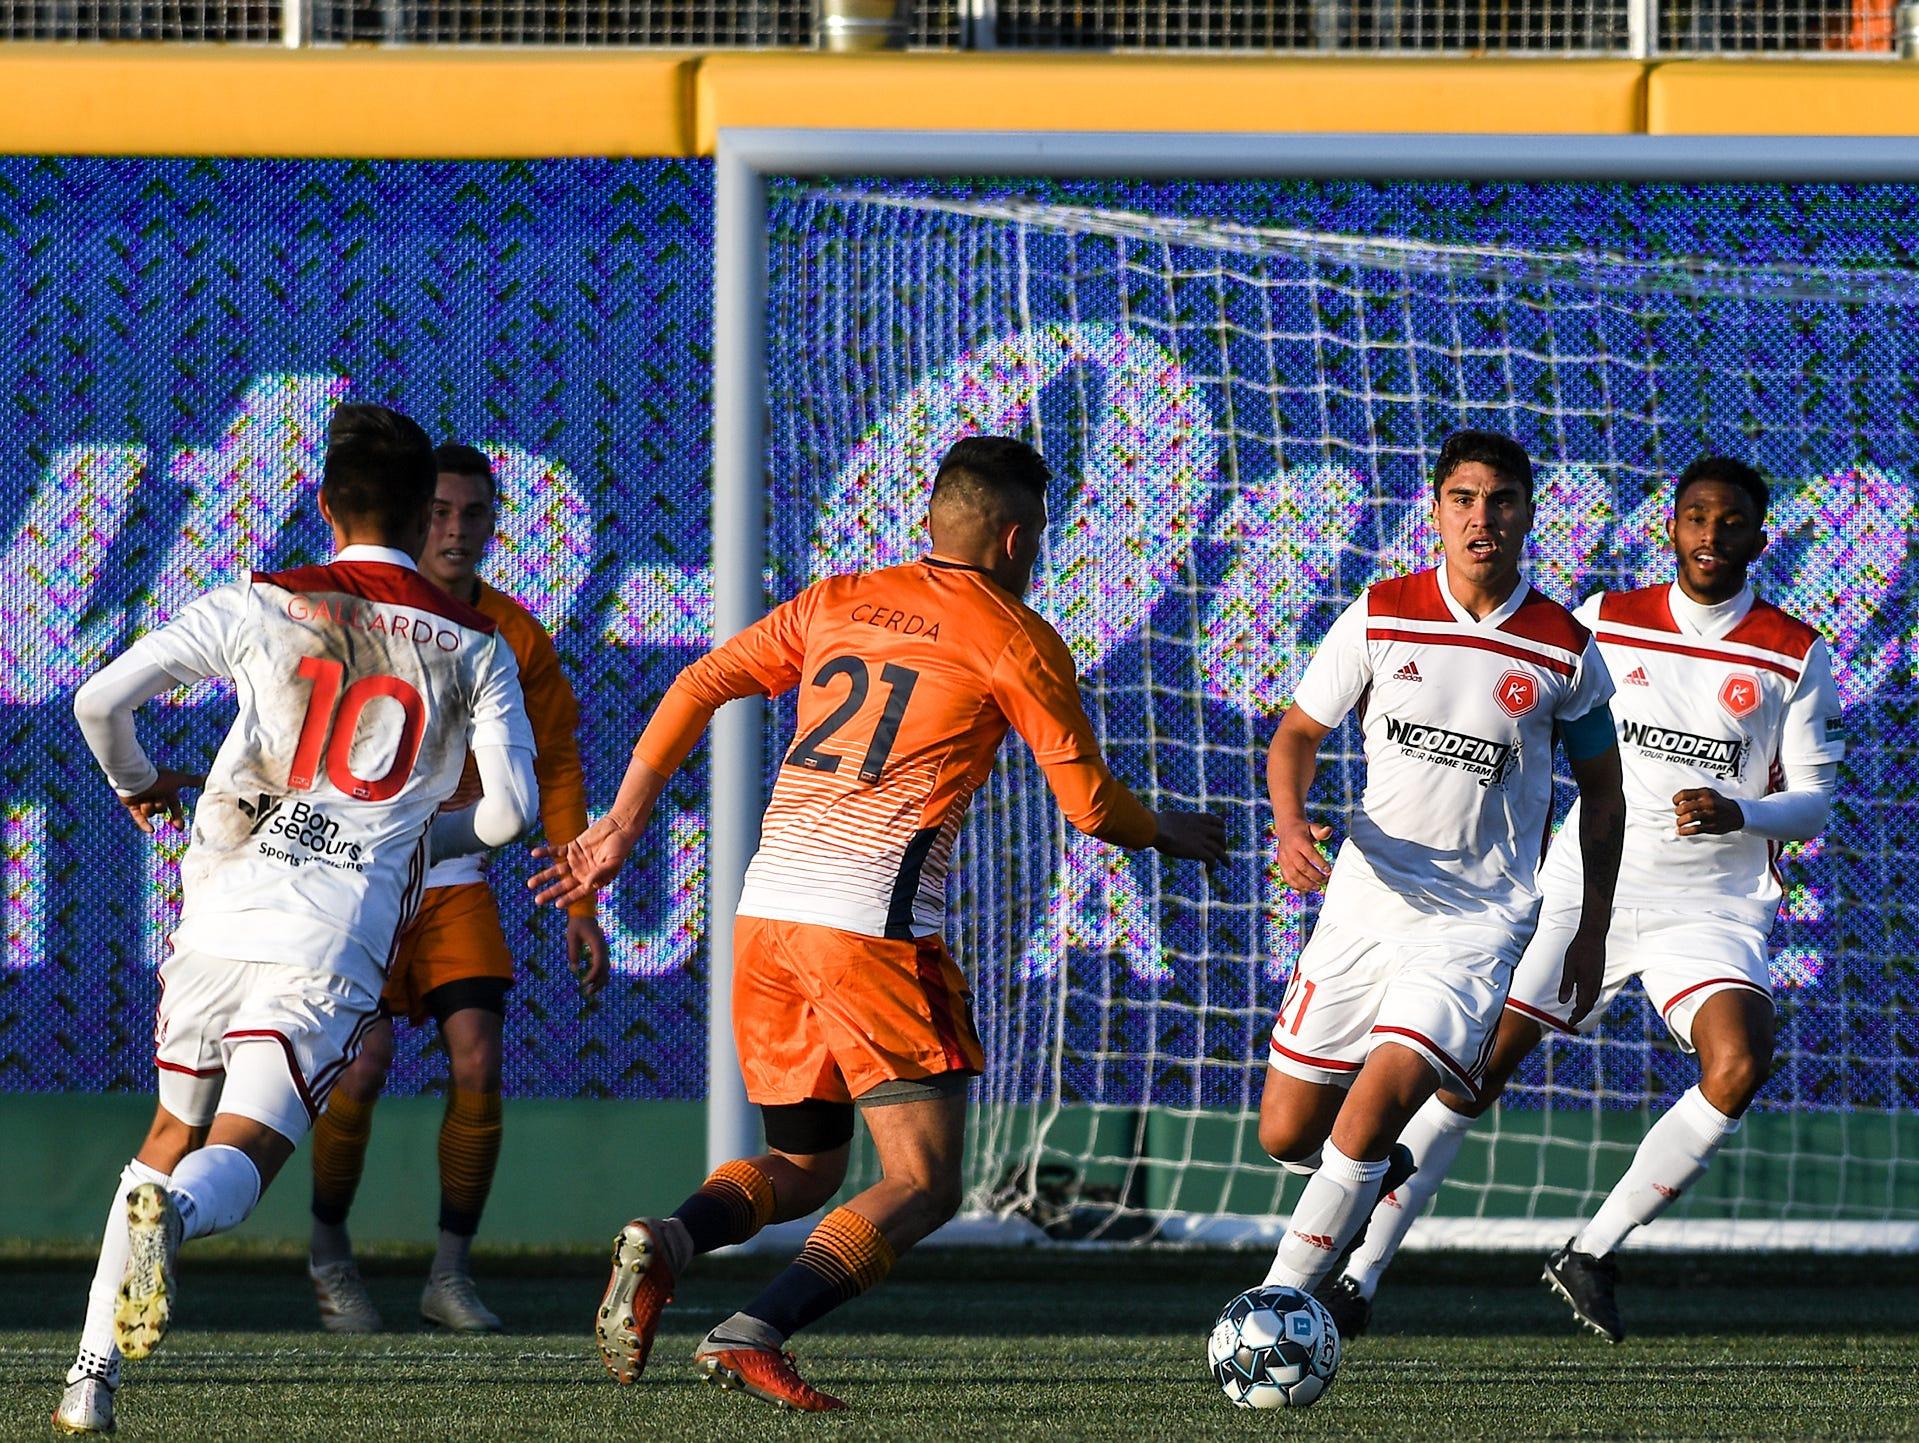 Lansing Ignite midfielder Ivo Cerda (21) tries a shot against Richmond Kickers Saturday, April 13, 2019.